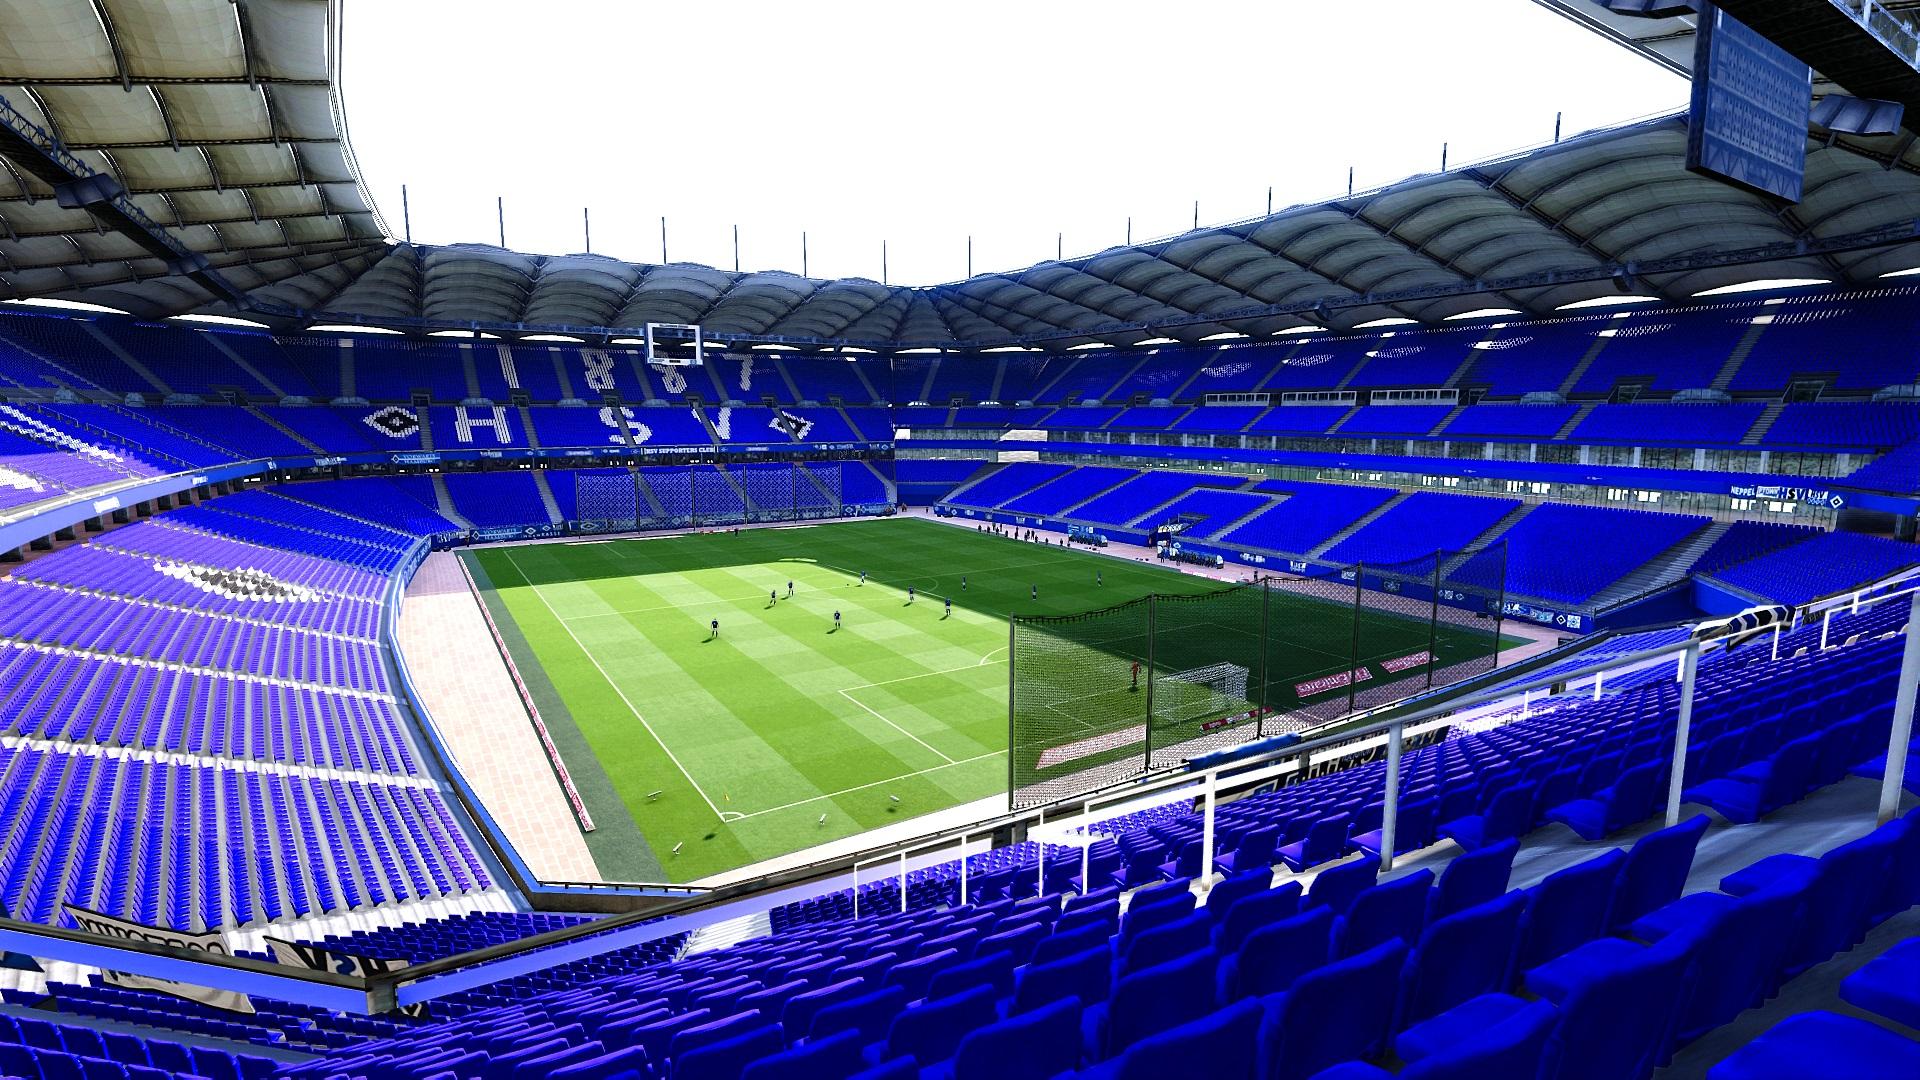 PES 2021 Stadium Volksparkstadion ~ PESNewupdate.com   Free Download Latest Pro Evolution Soccer Patch & Updates